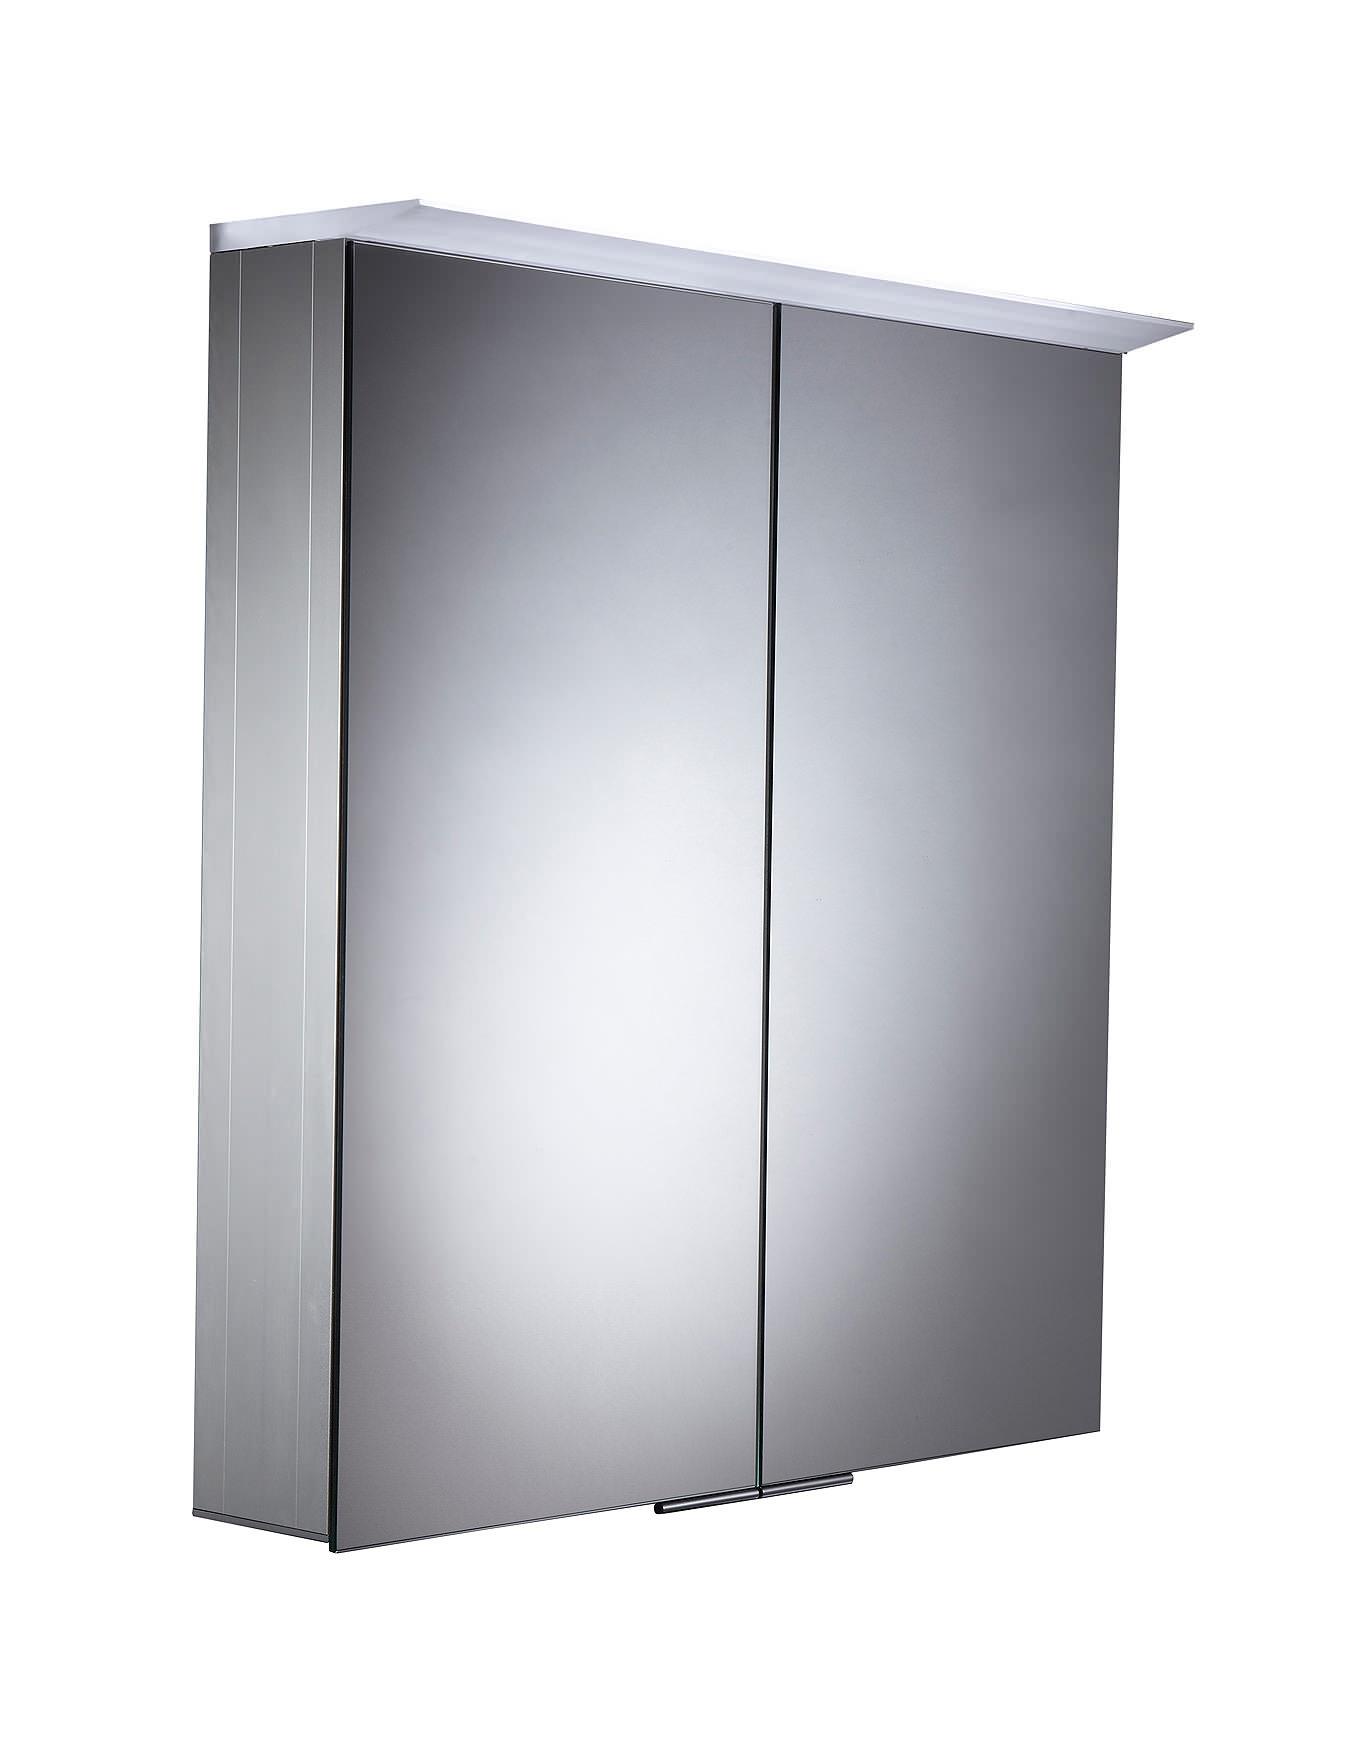 Roper Rhodes Venture 655 x 705mm Illuminated Cabinet   VE65AL